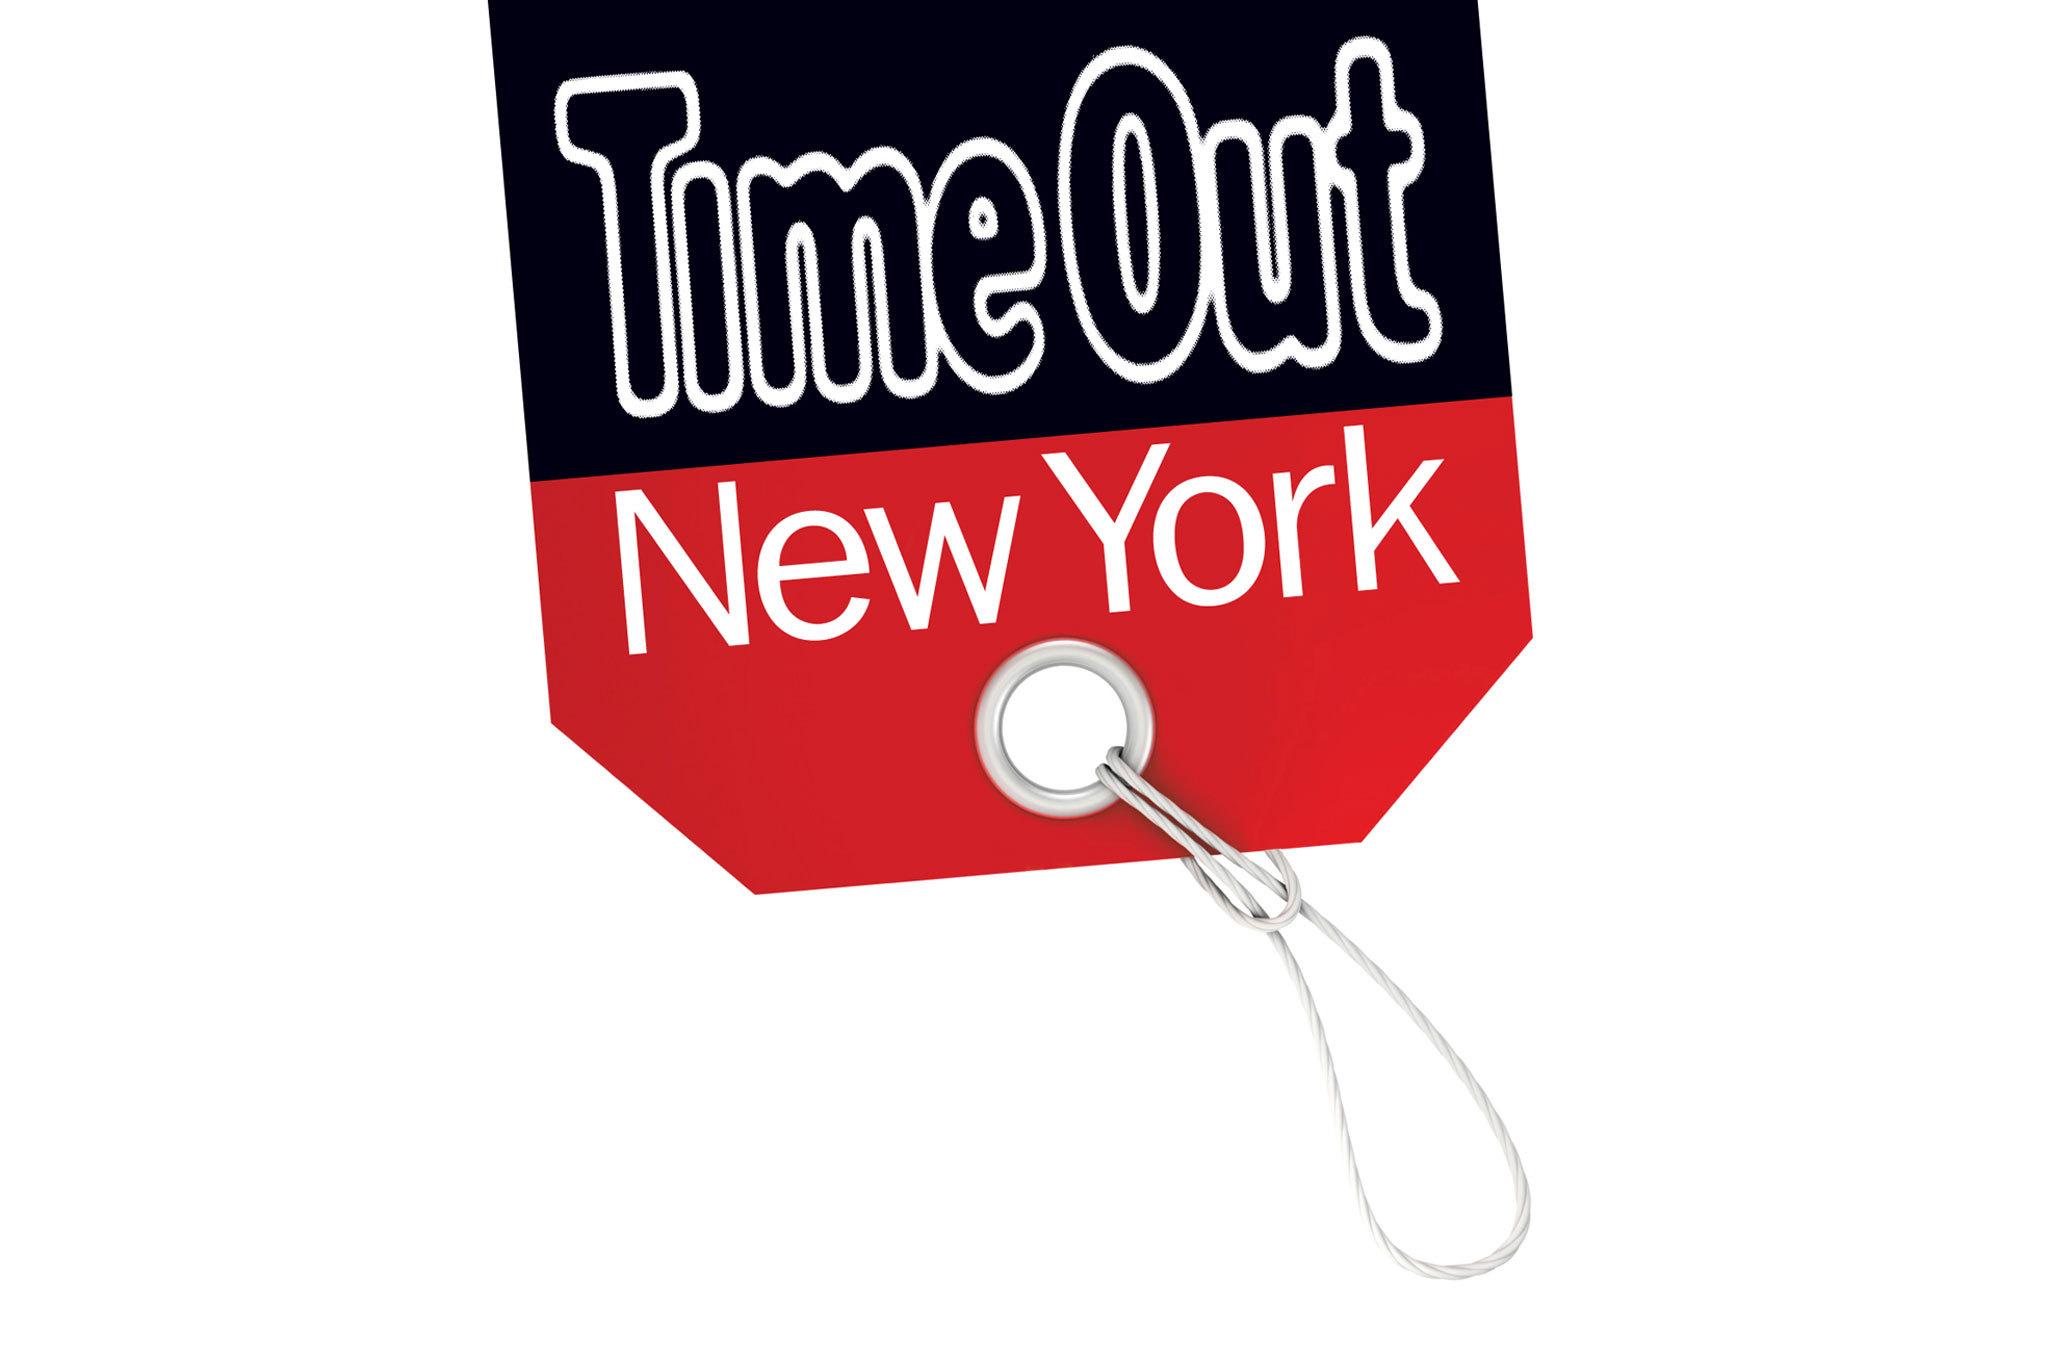 Best New York deals